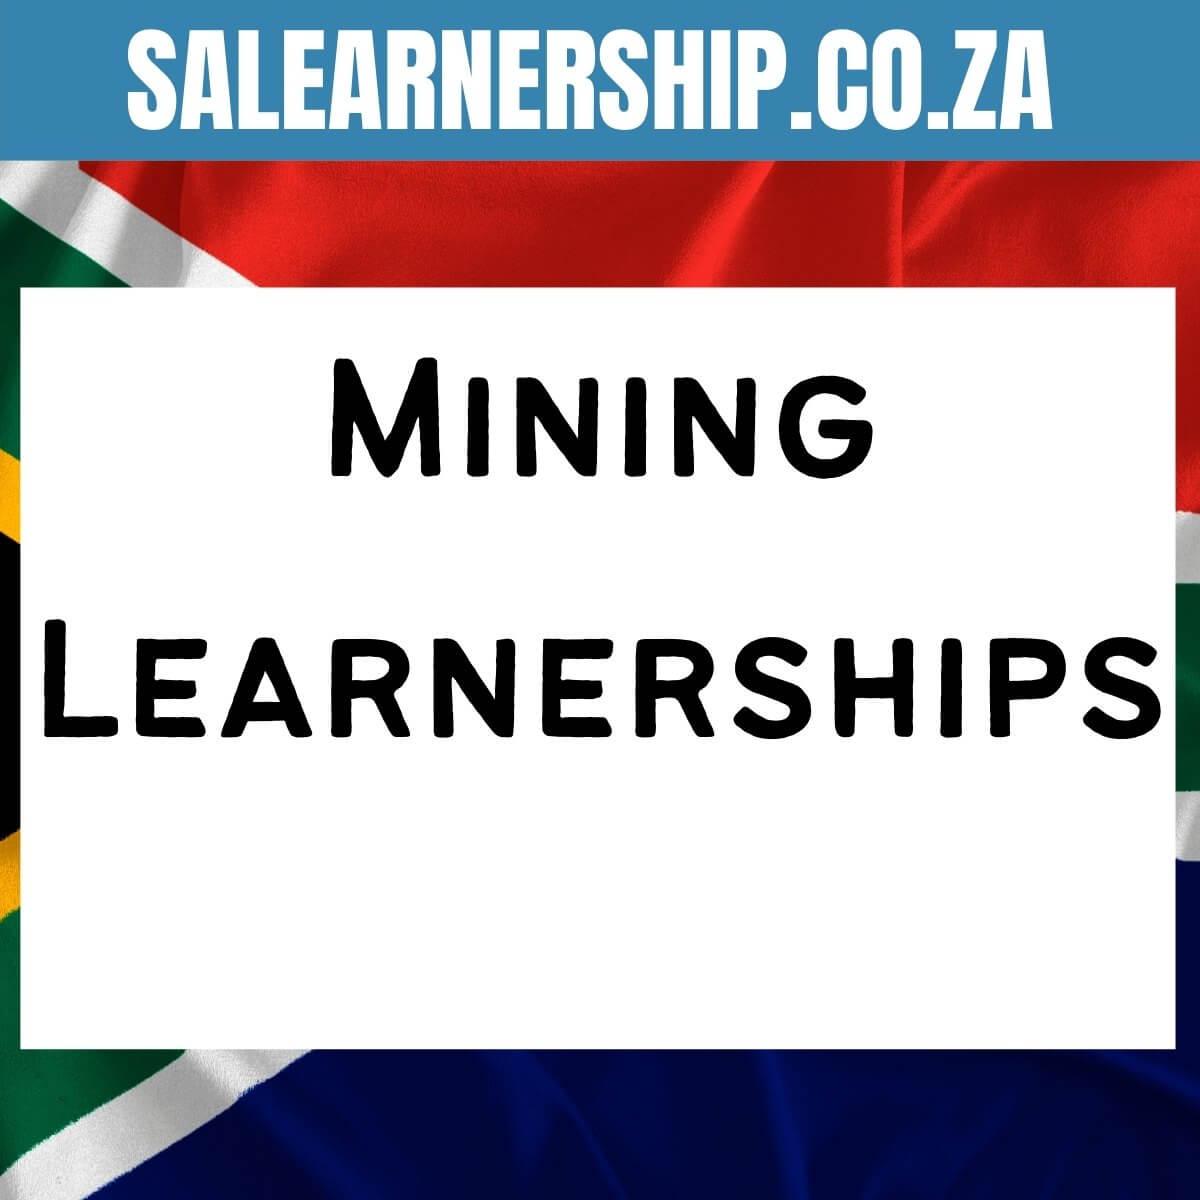 mining learnerships